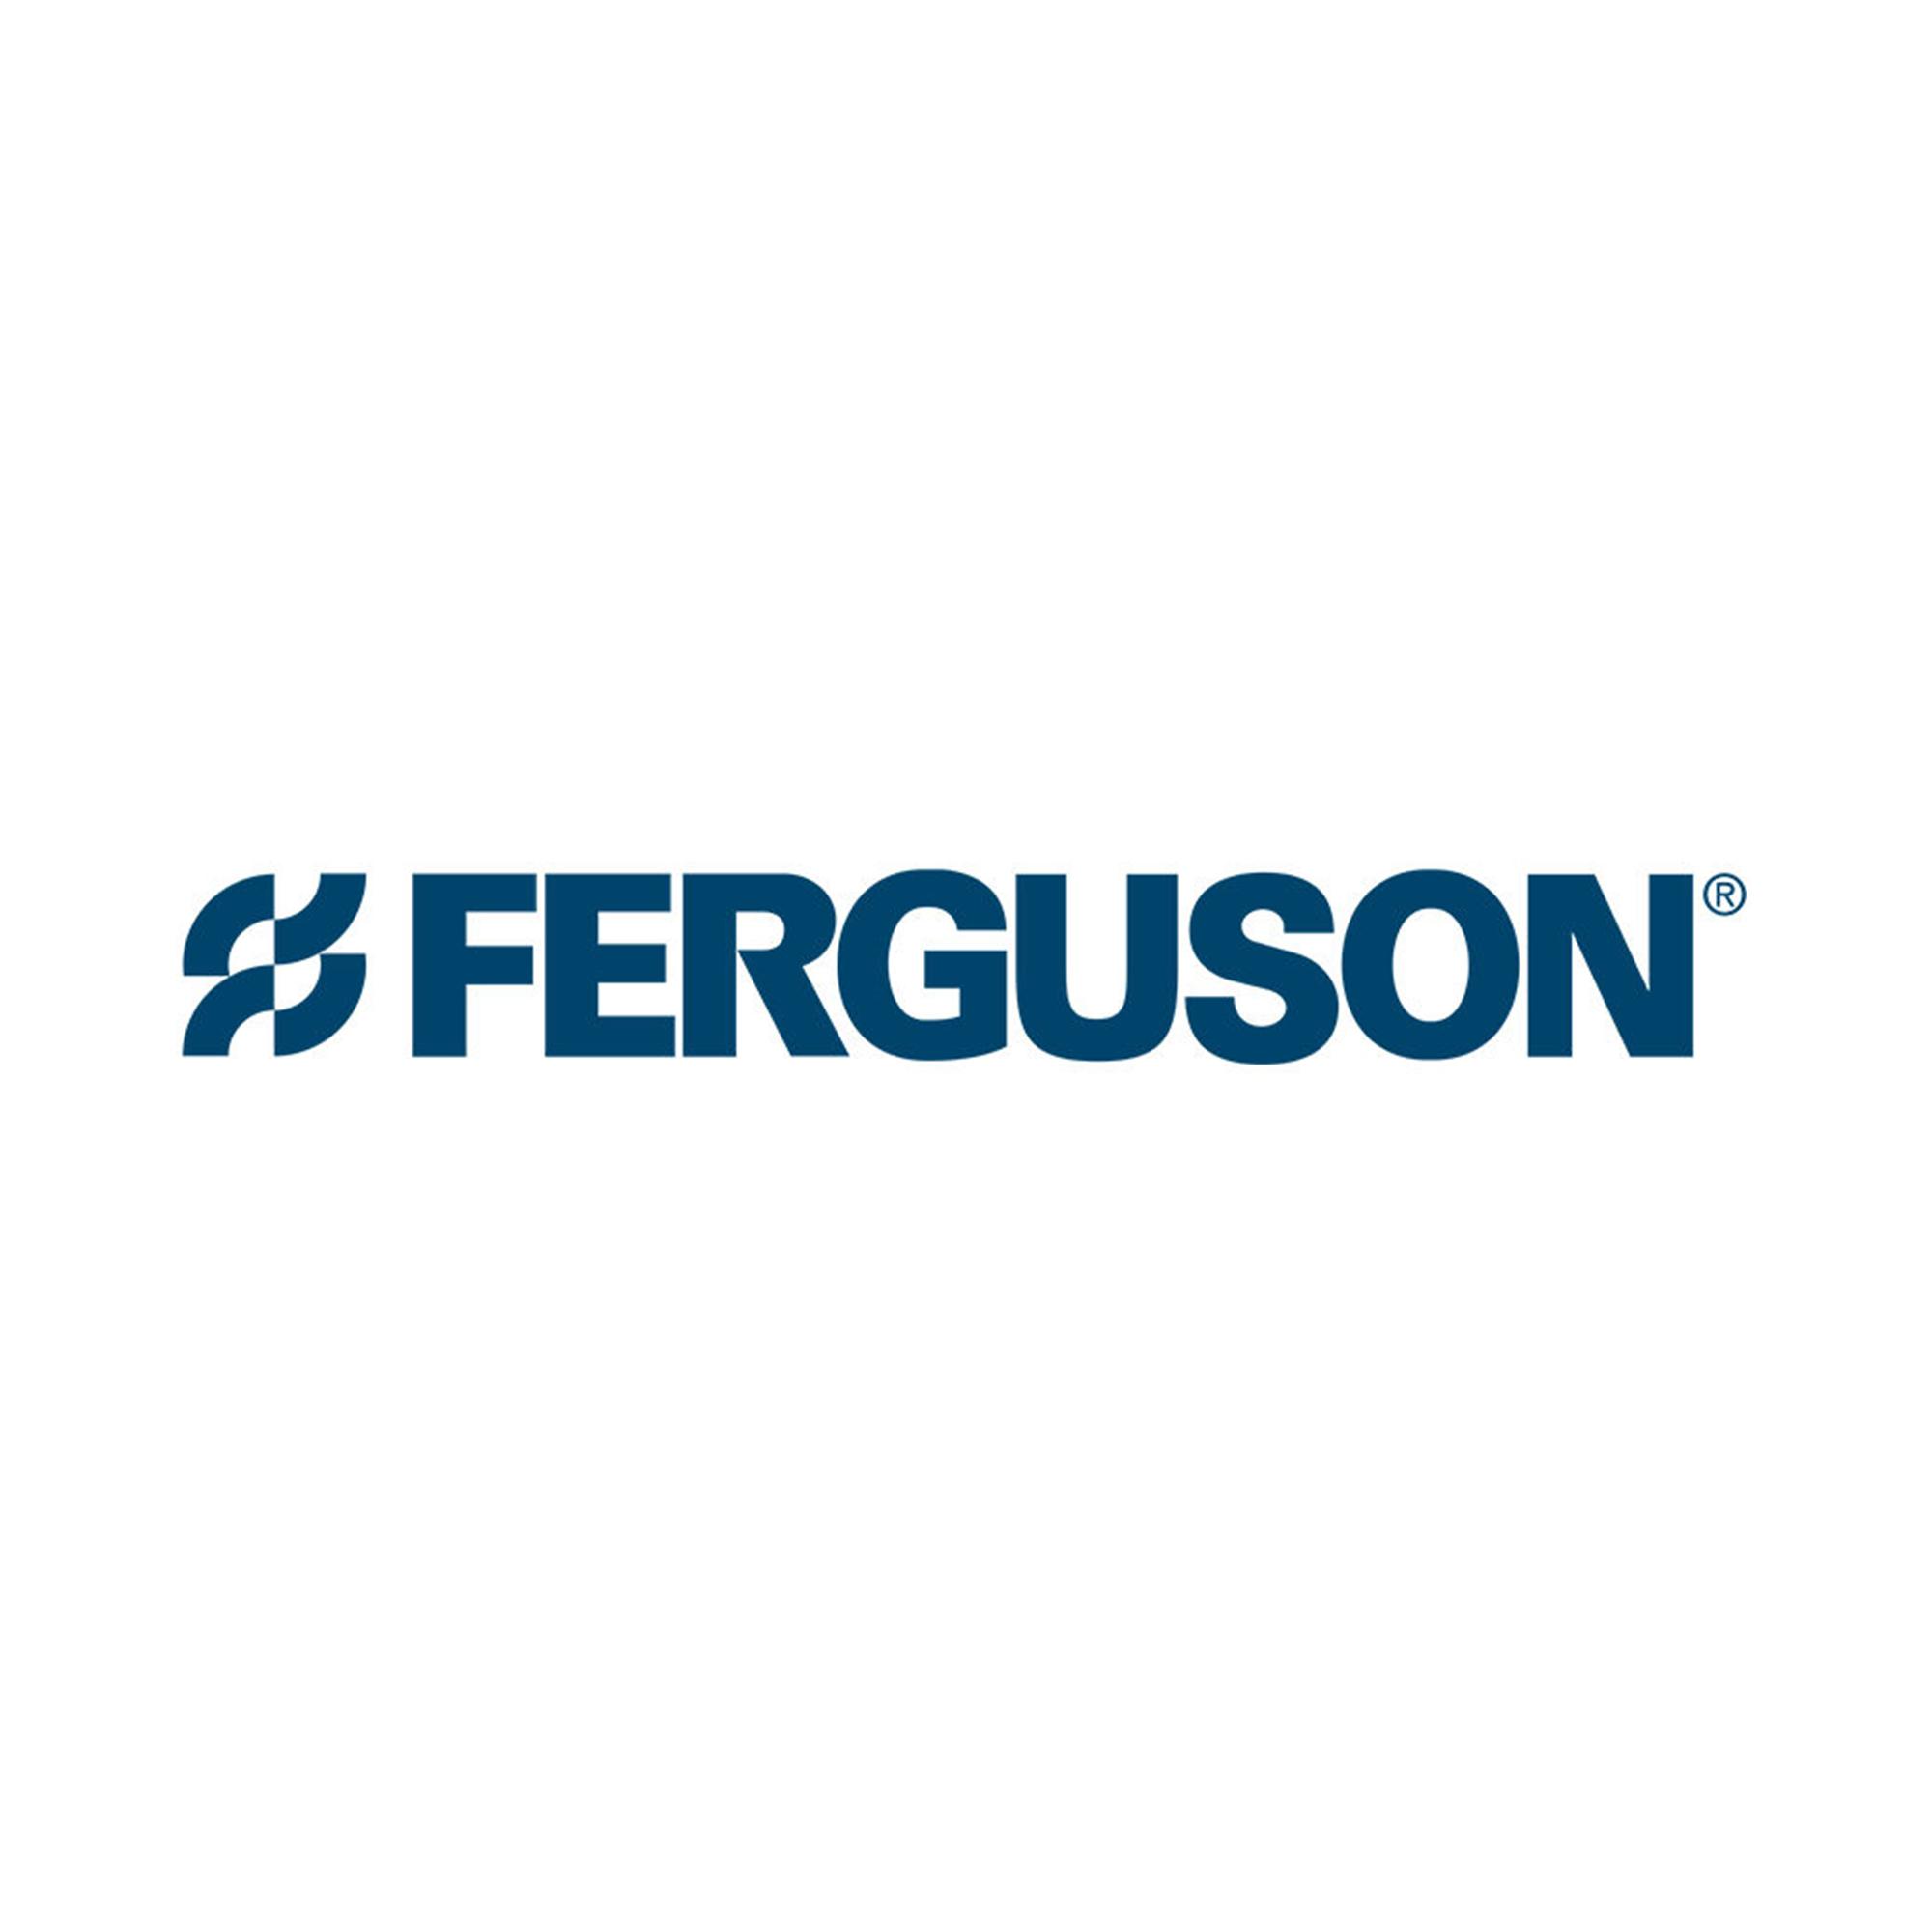 Ferguson Logo